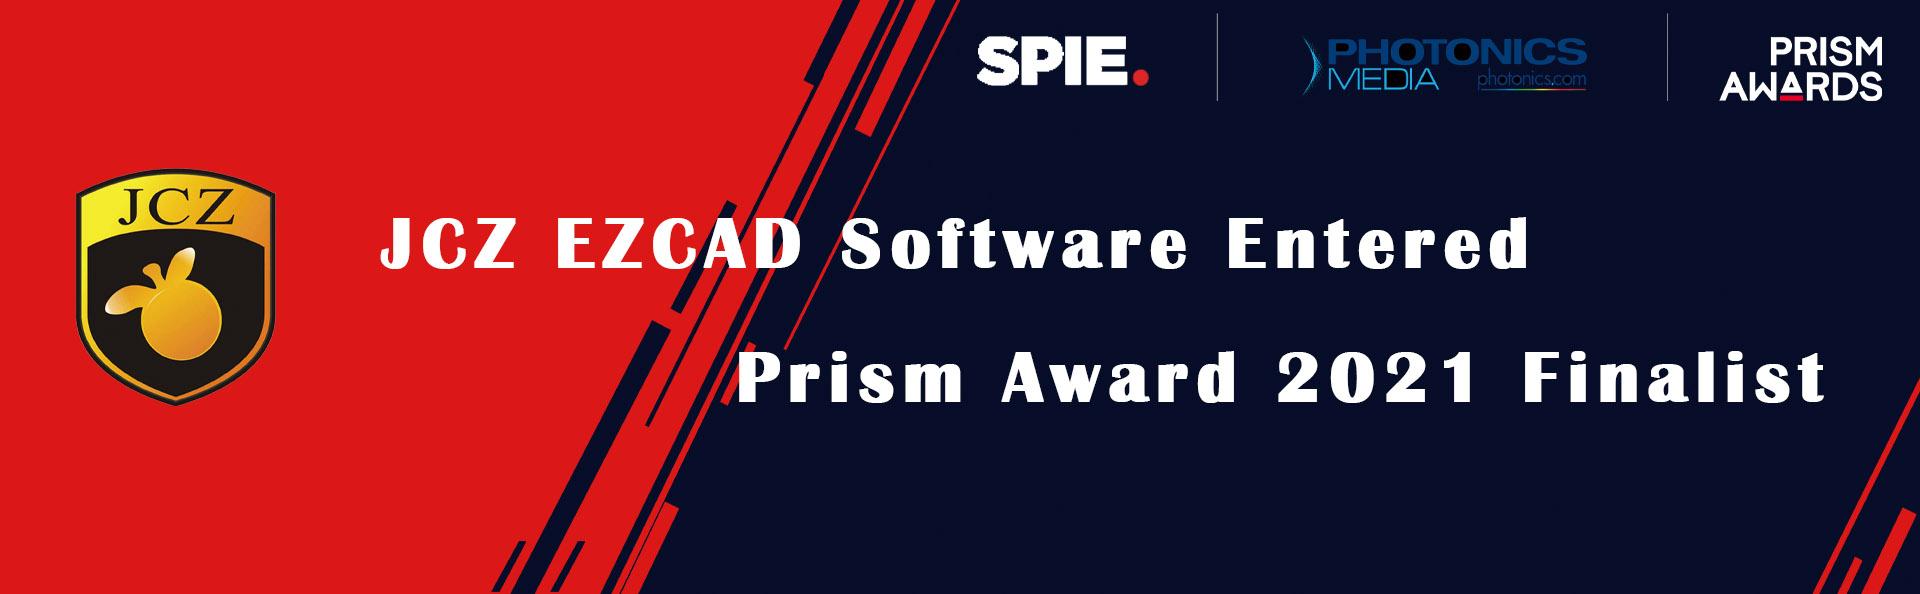 Prism Award 2021 Finalist